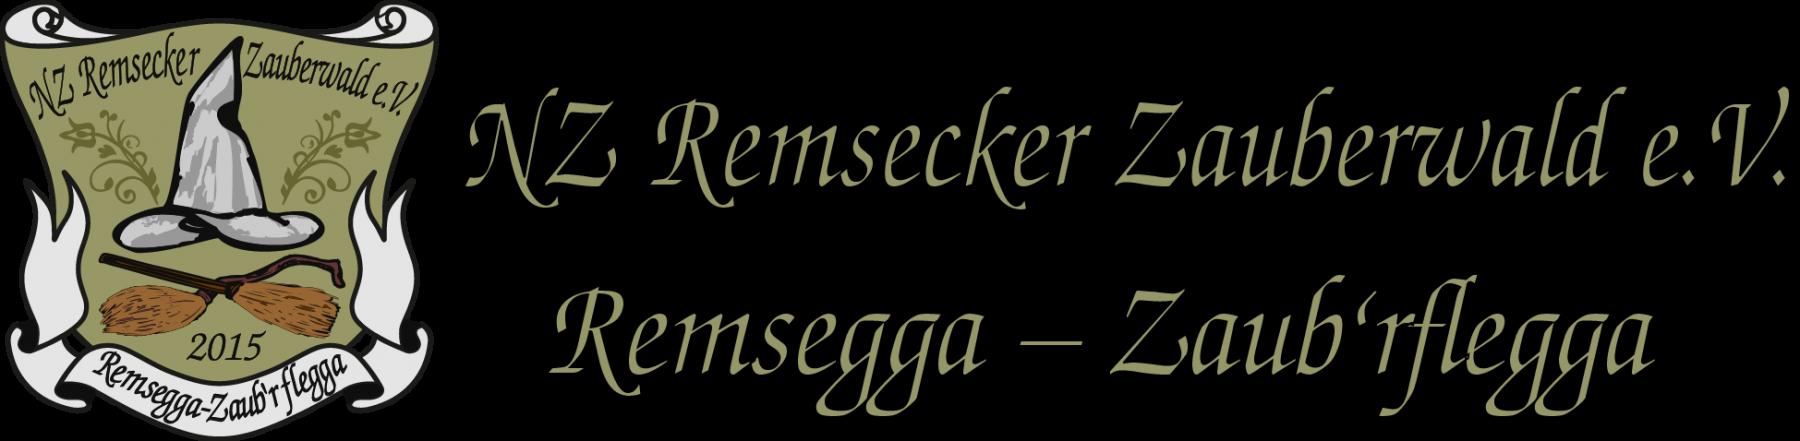 NZ Remsecker Zauberwald e.V.